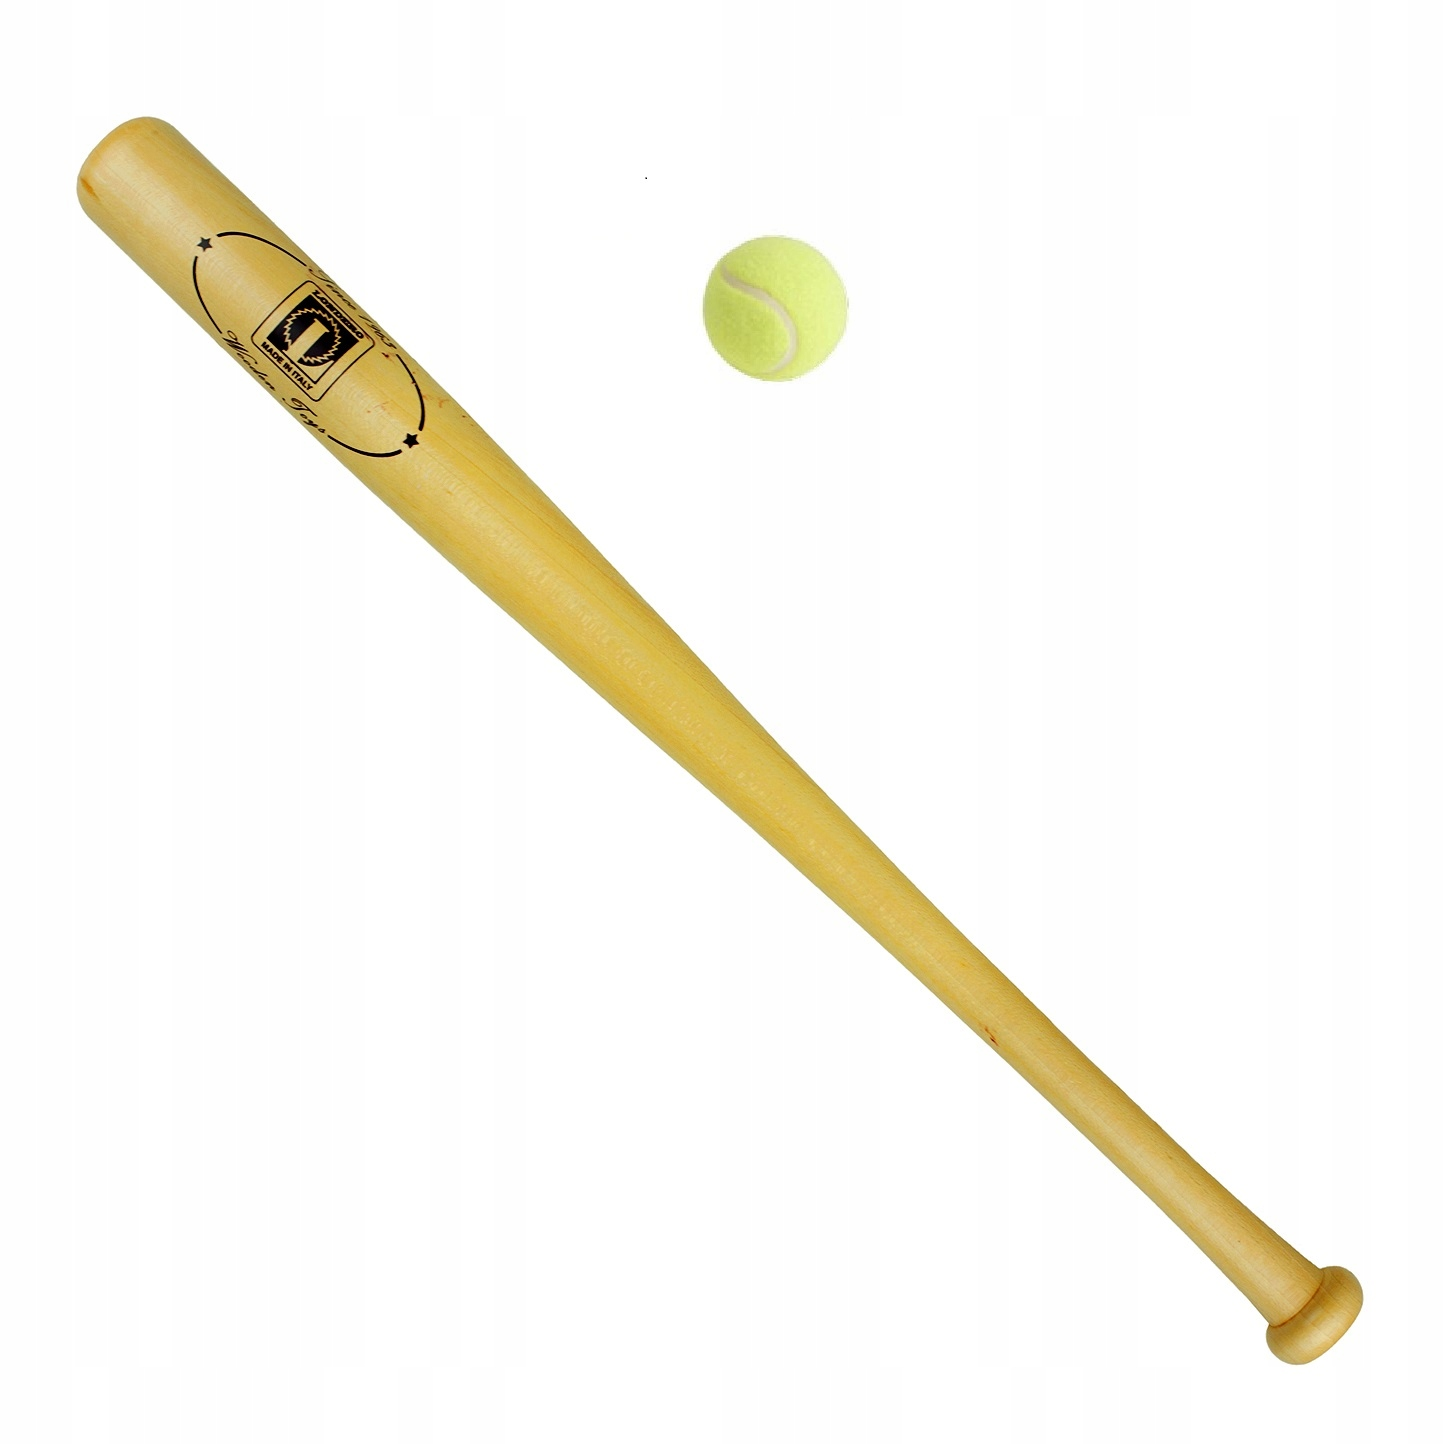 Sada 2W1 Baseballová palica 75 cm s loptou Londera